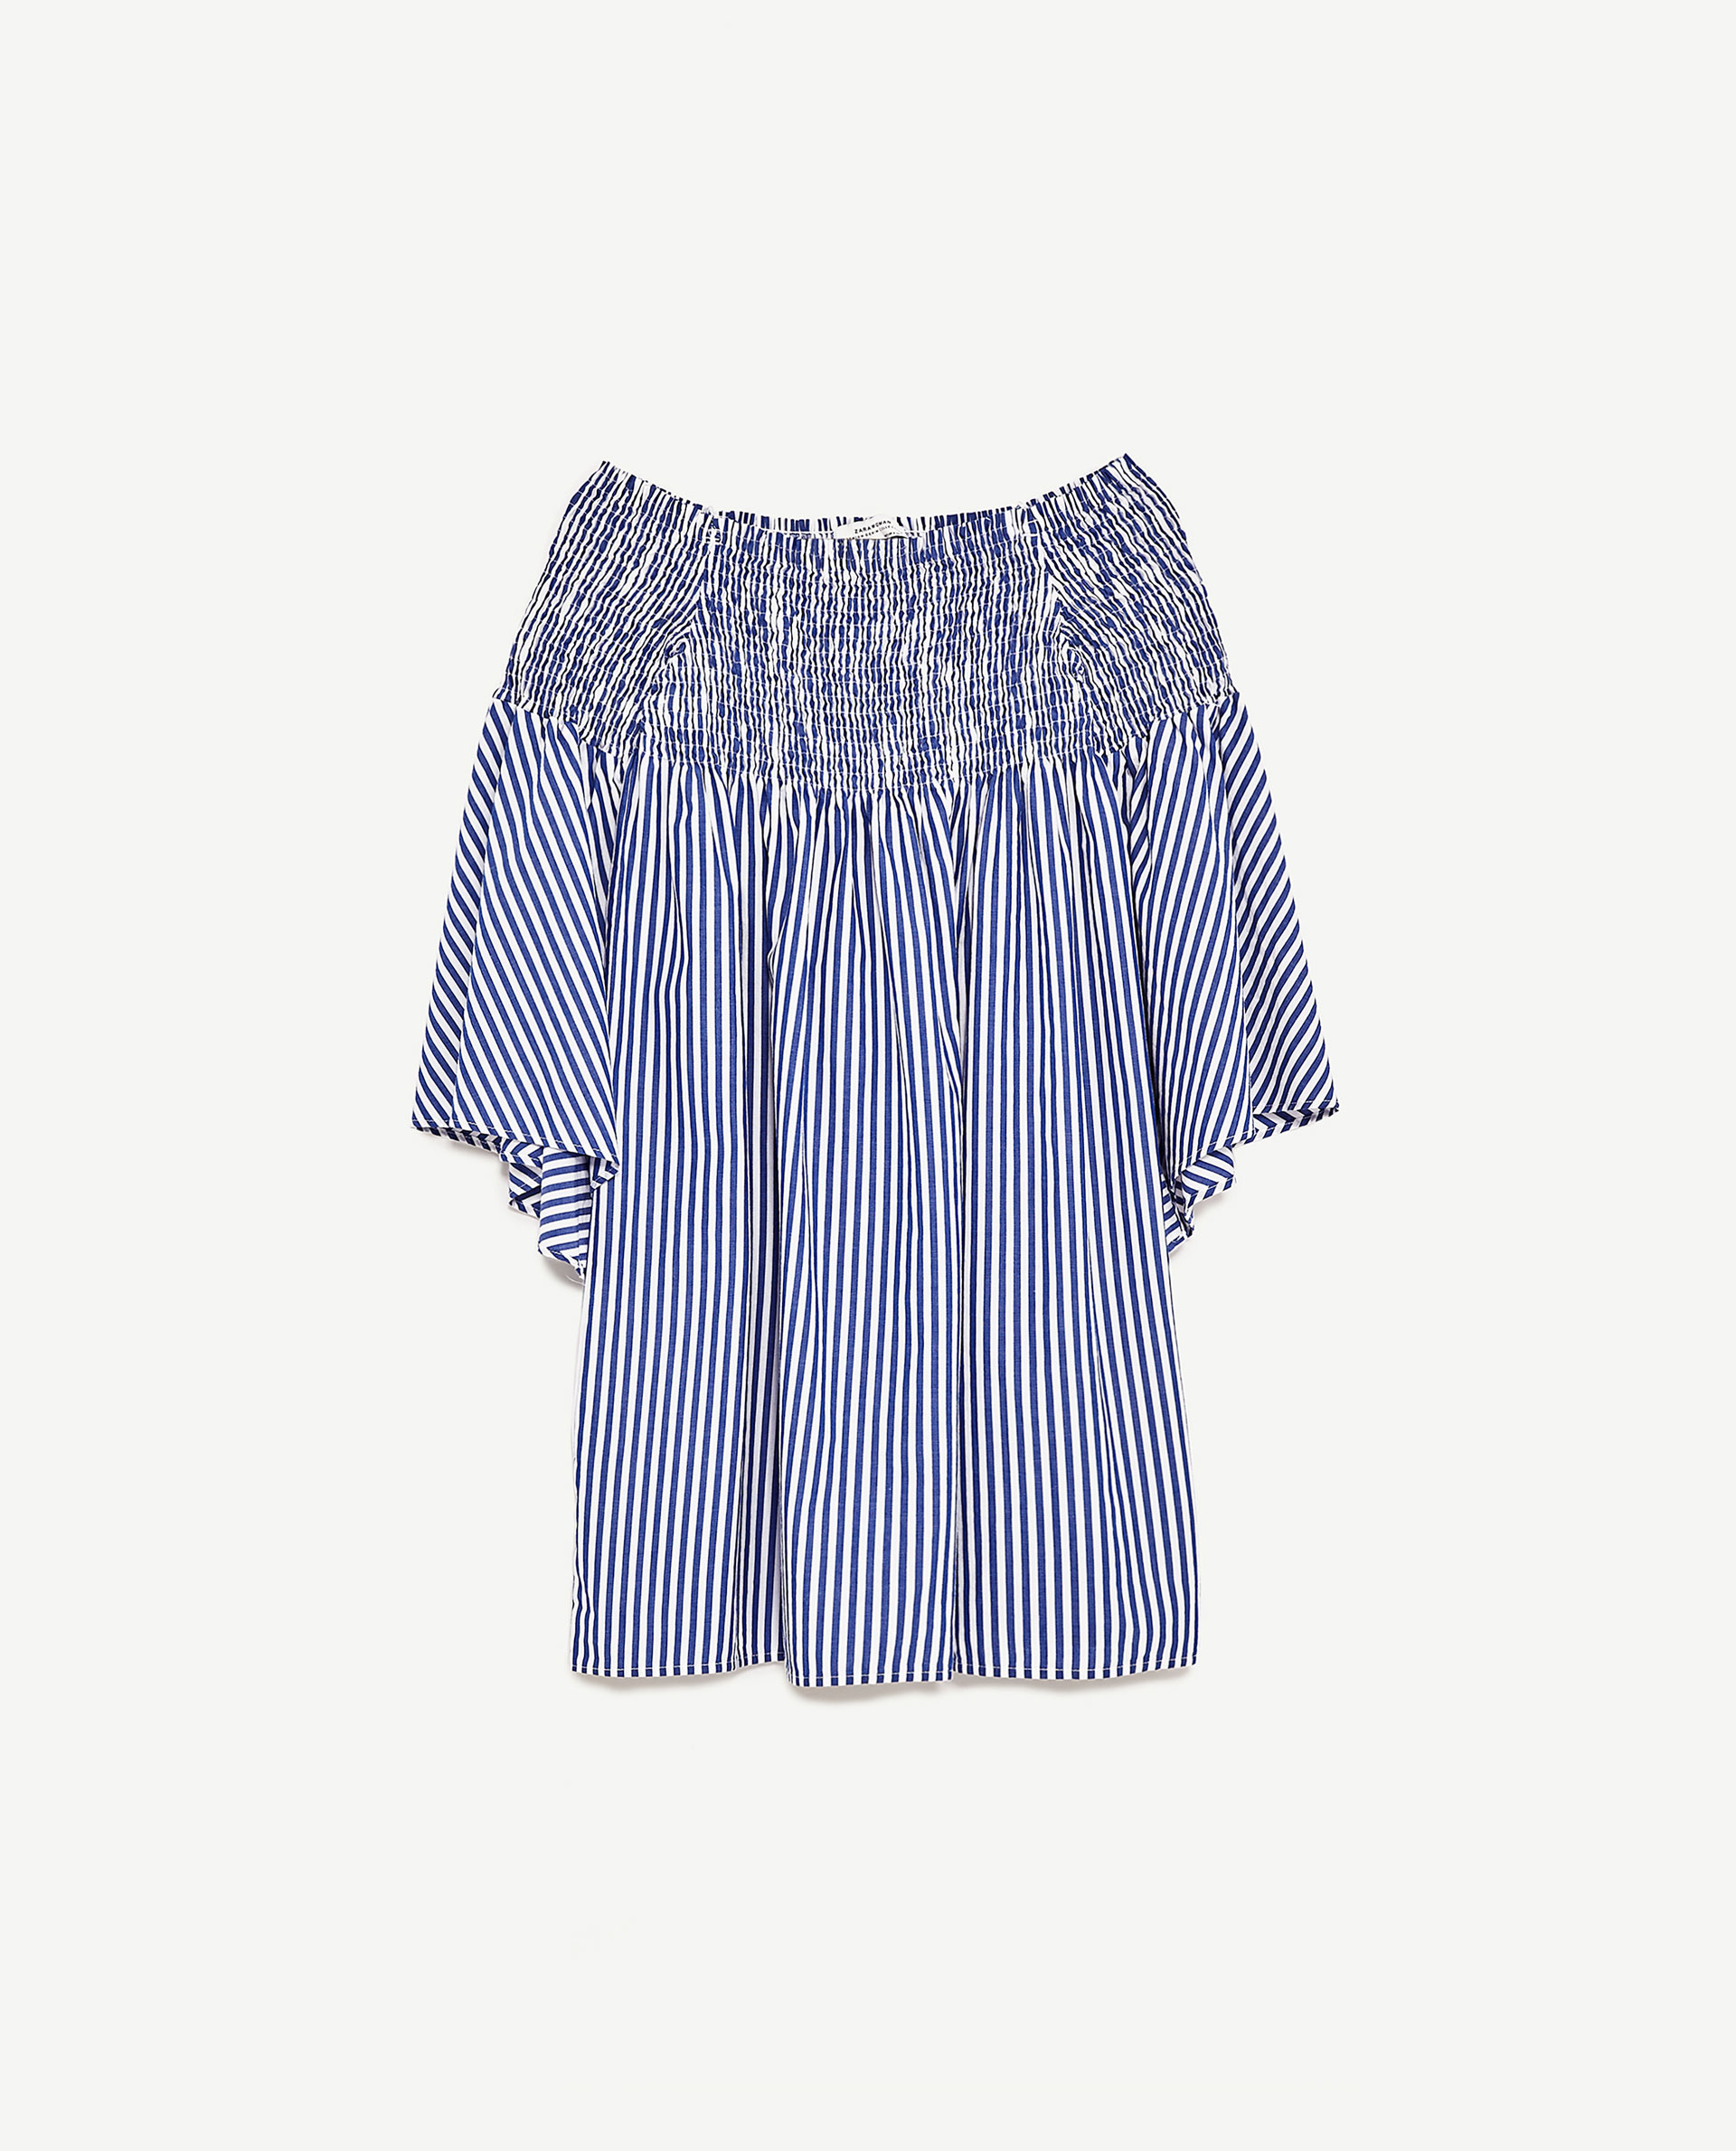 e687df12ead6 Κορίτσια τρέξτε  Aυτό το Zara φόρεμα κοστίζει ελάχιστα και πάει να ...